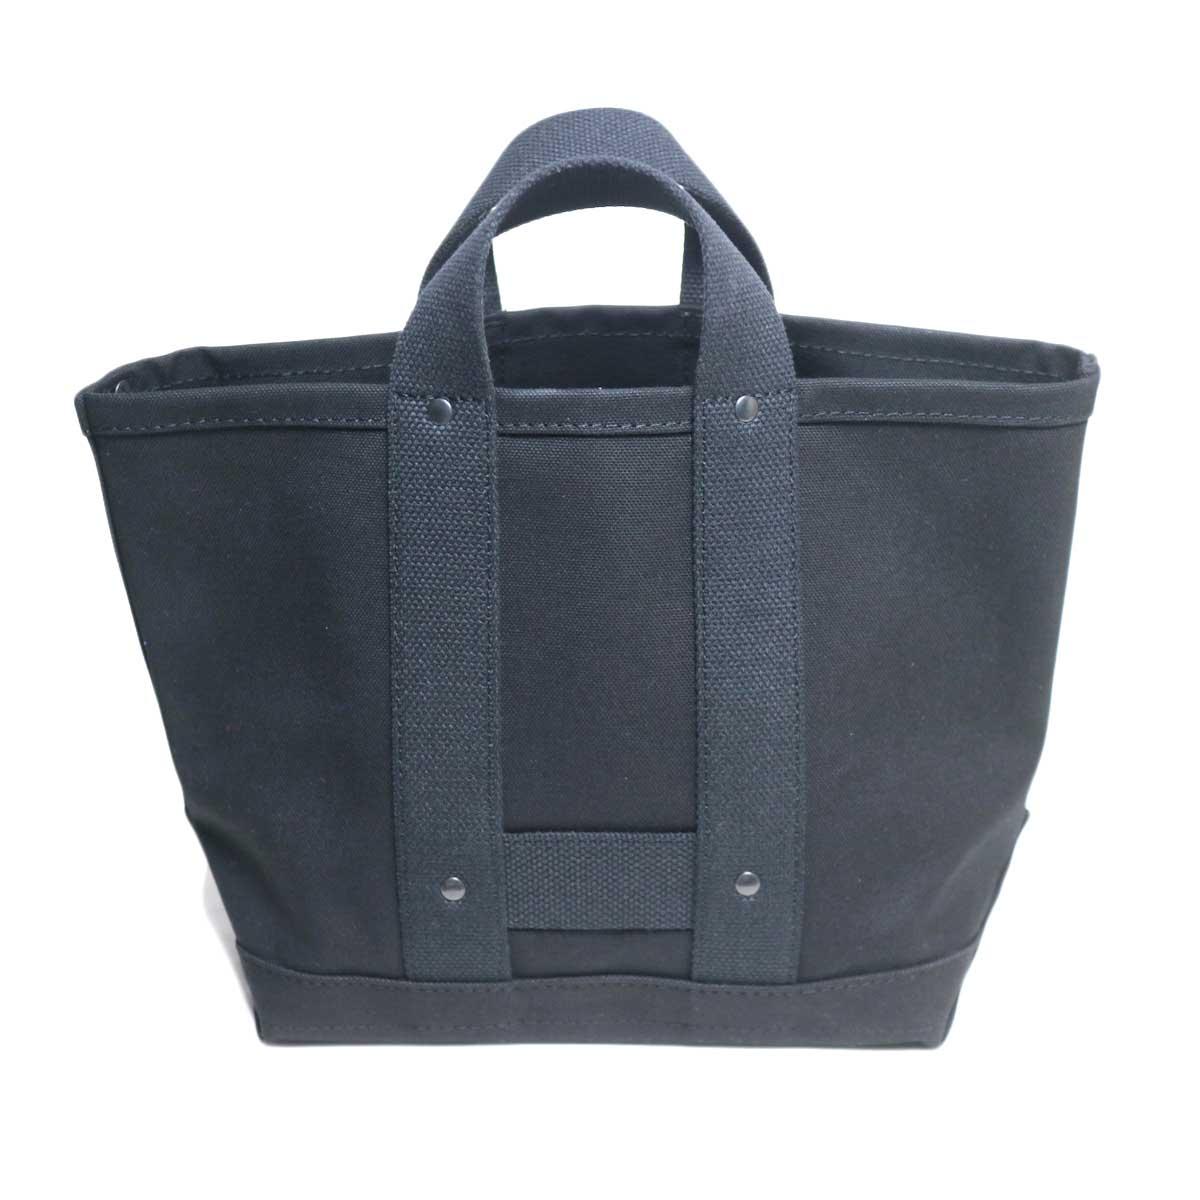 MASTER & Co. / RAILMAN BAG (Black S)